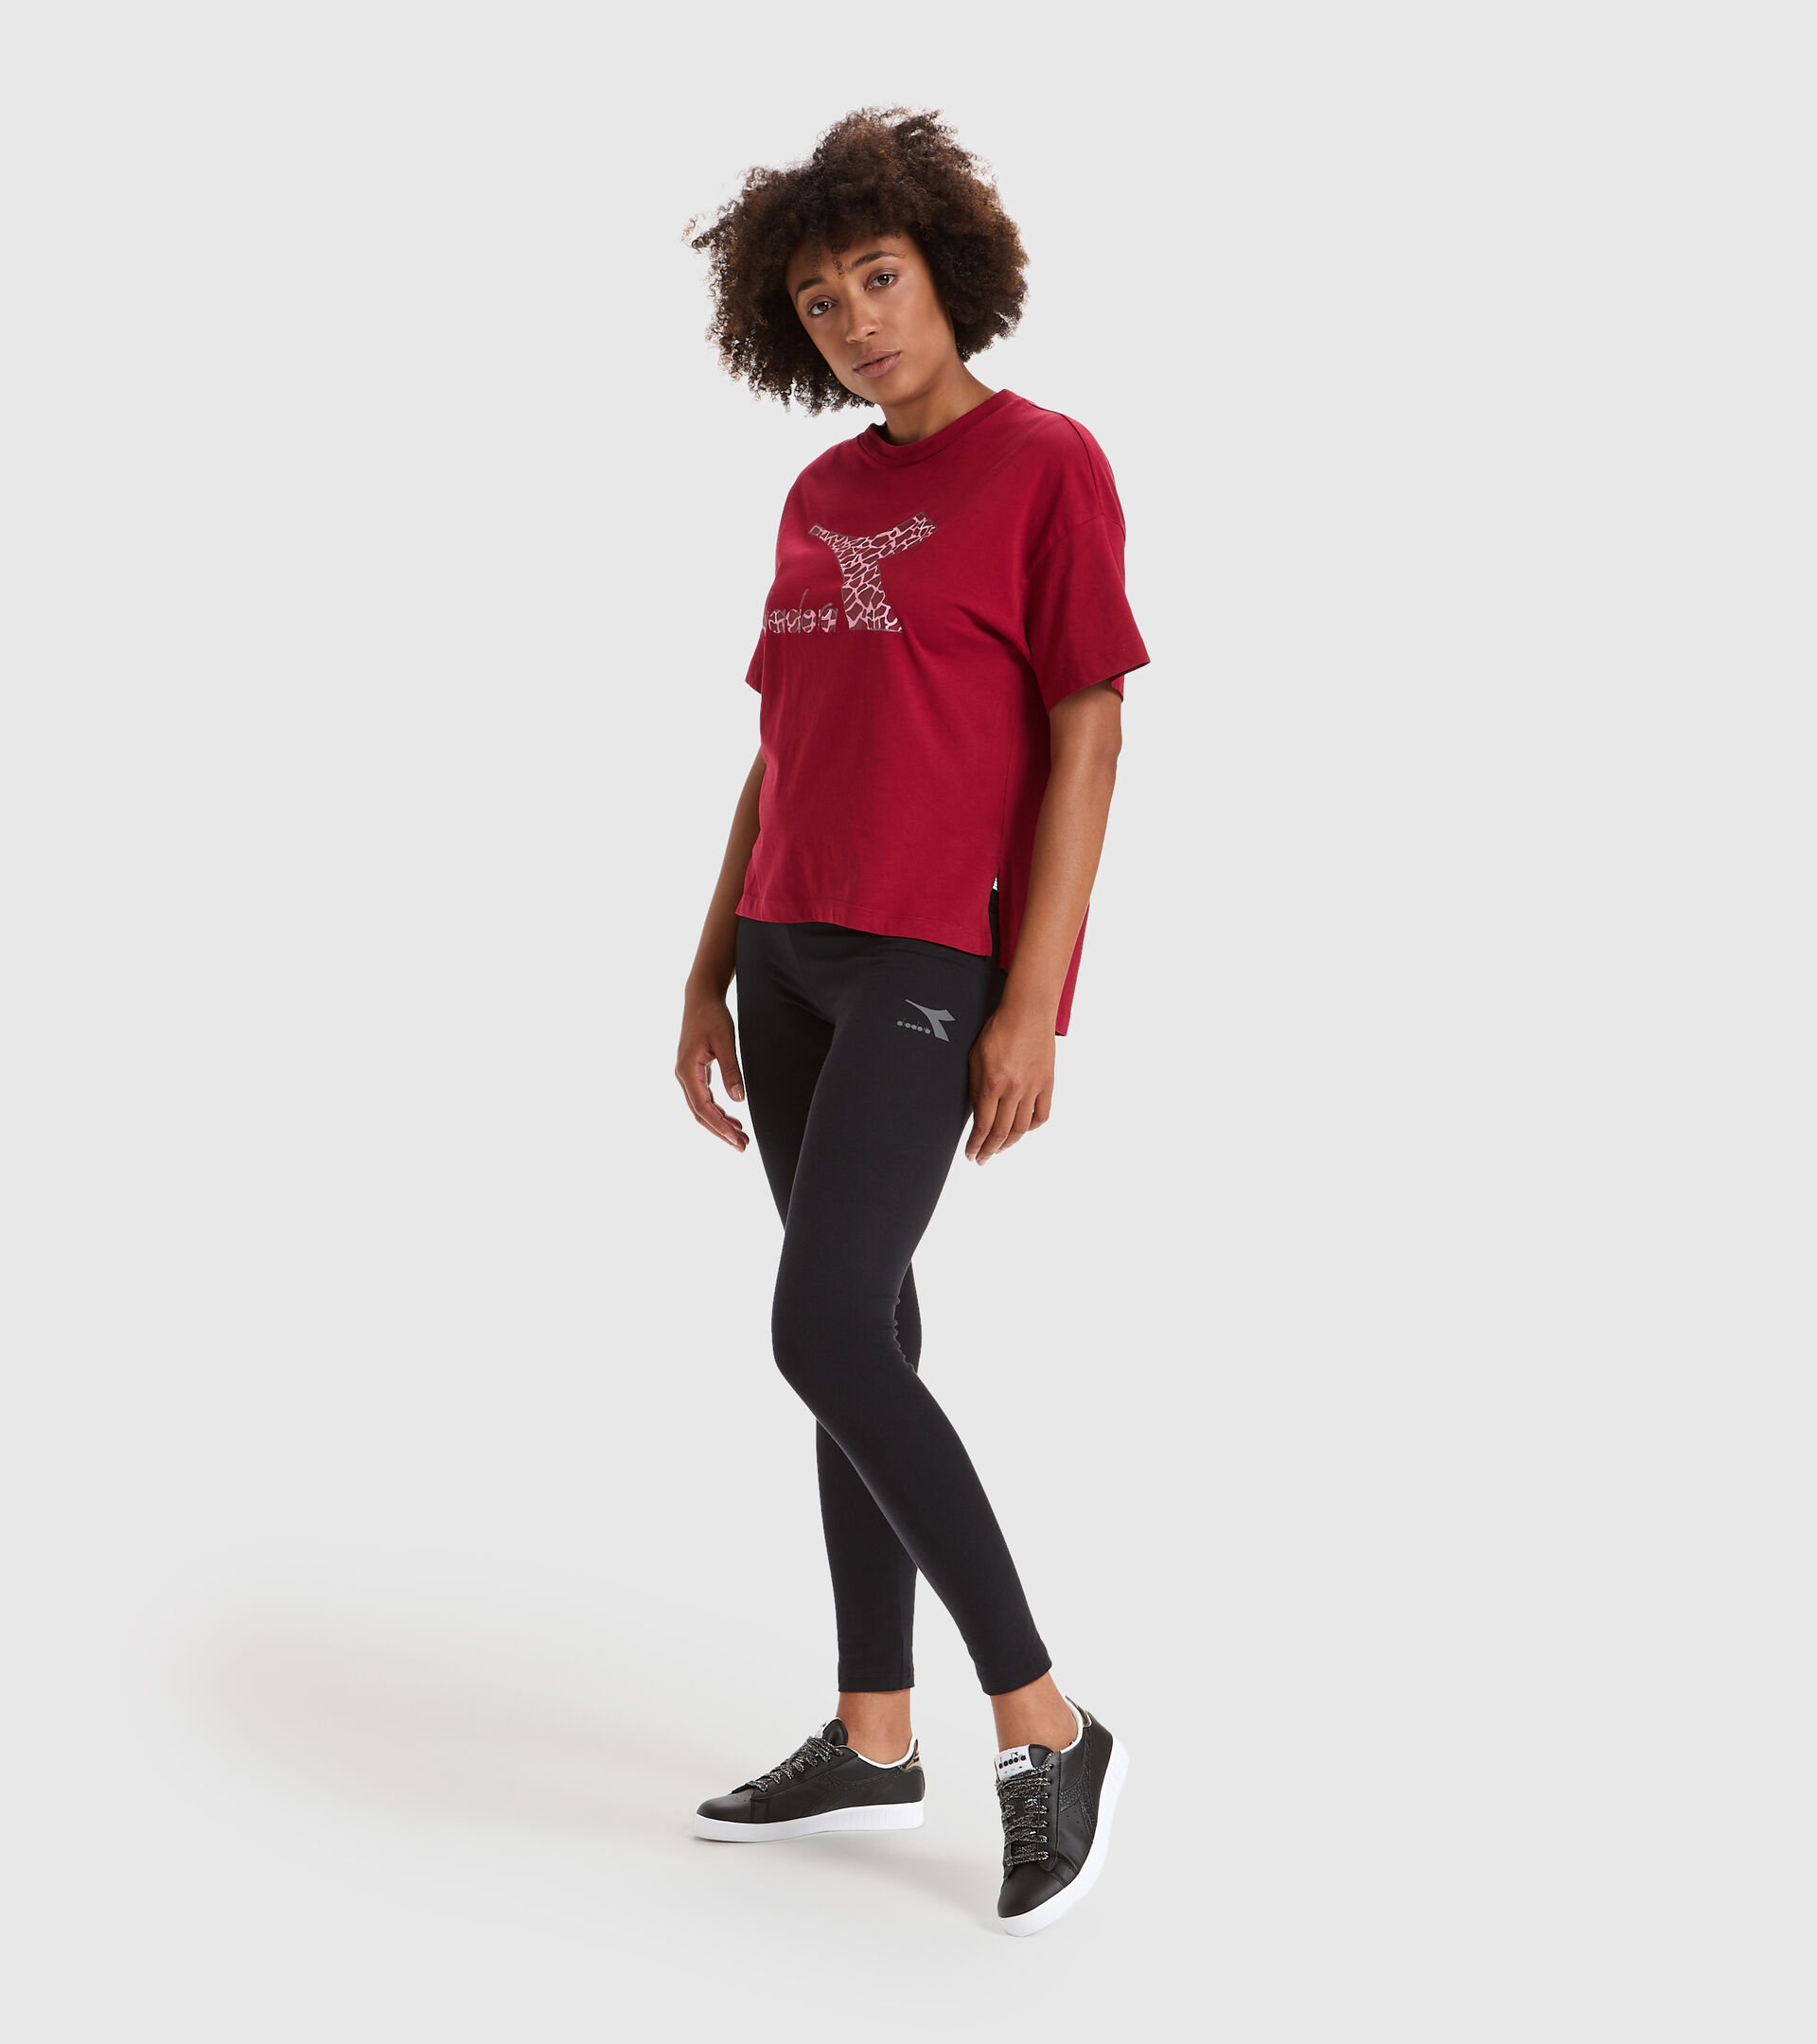 Camiseta - Mujer L.T-SHIRT SS LUSH RUIBARBO - Diadora